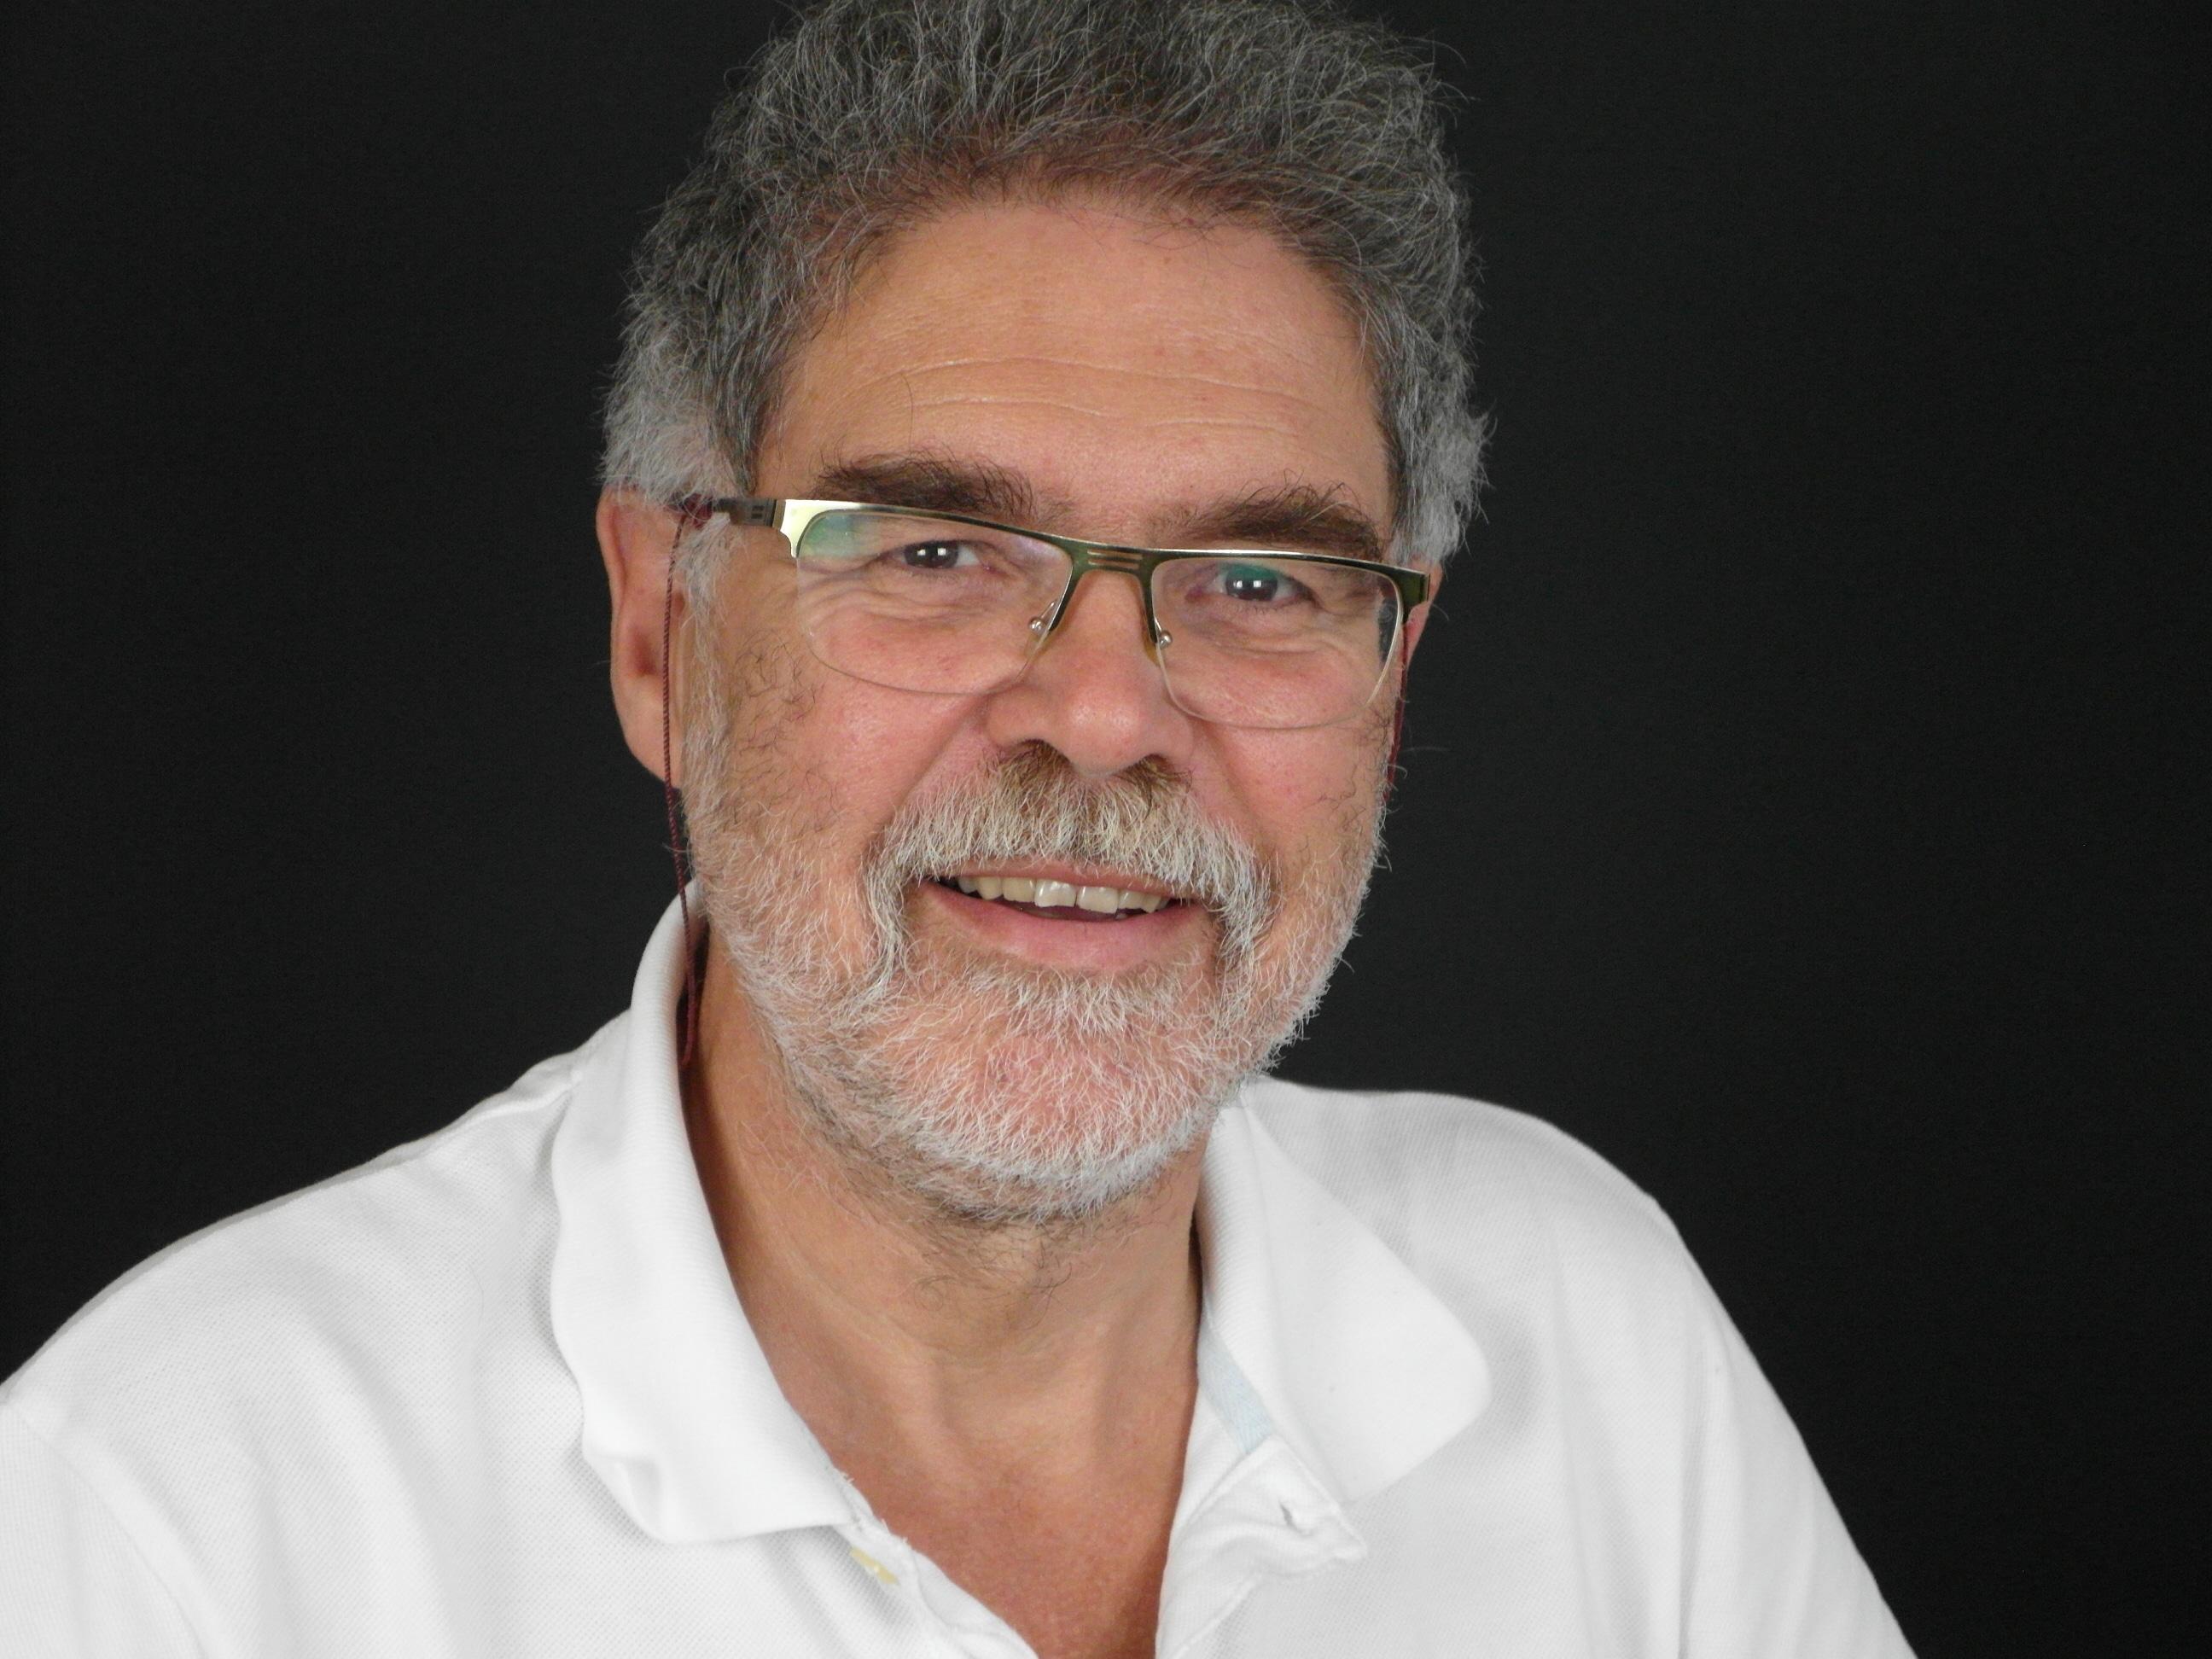 Veradent Dr. Hock Anästhesist